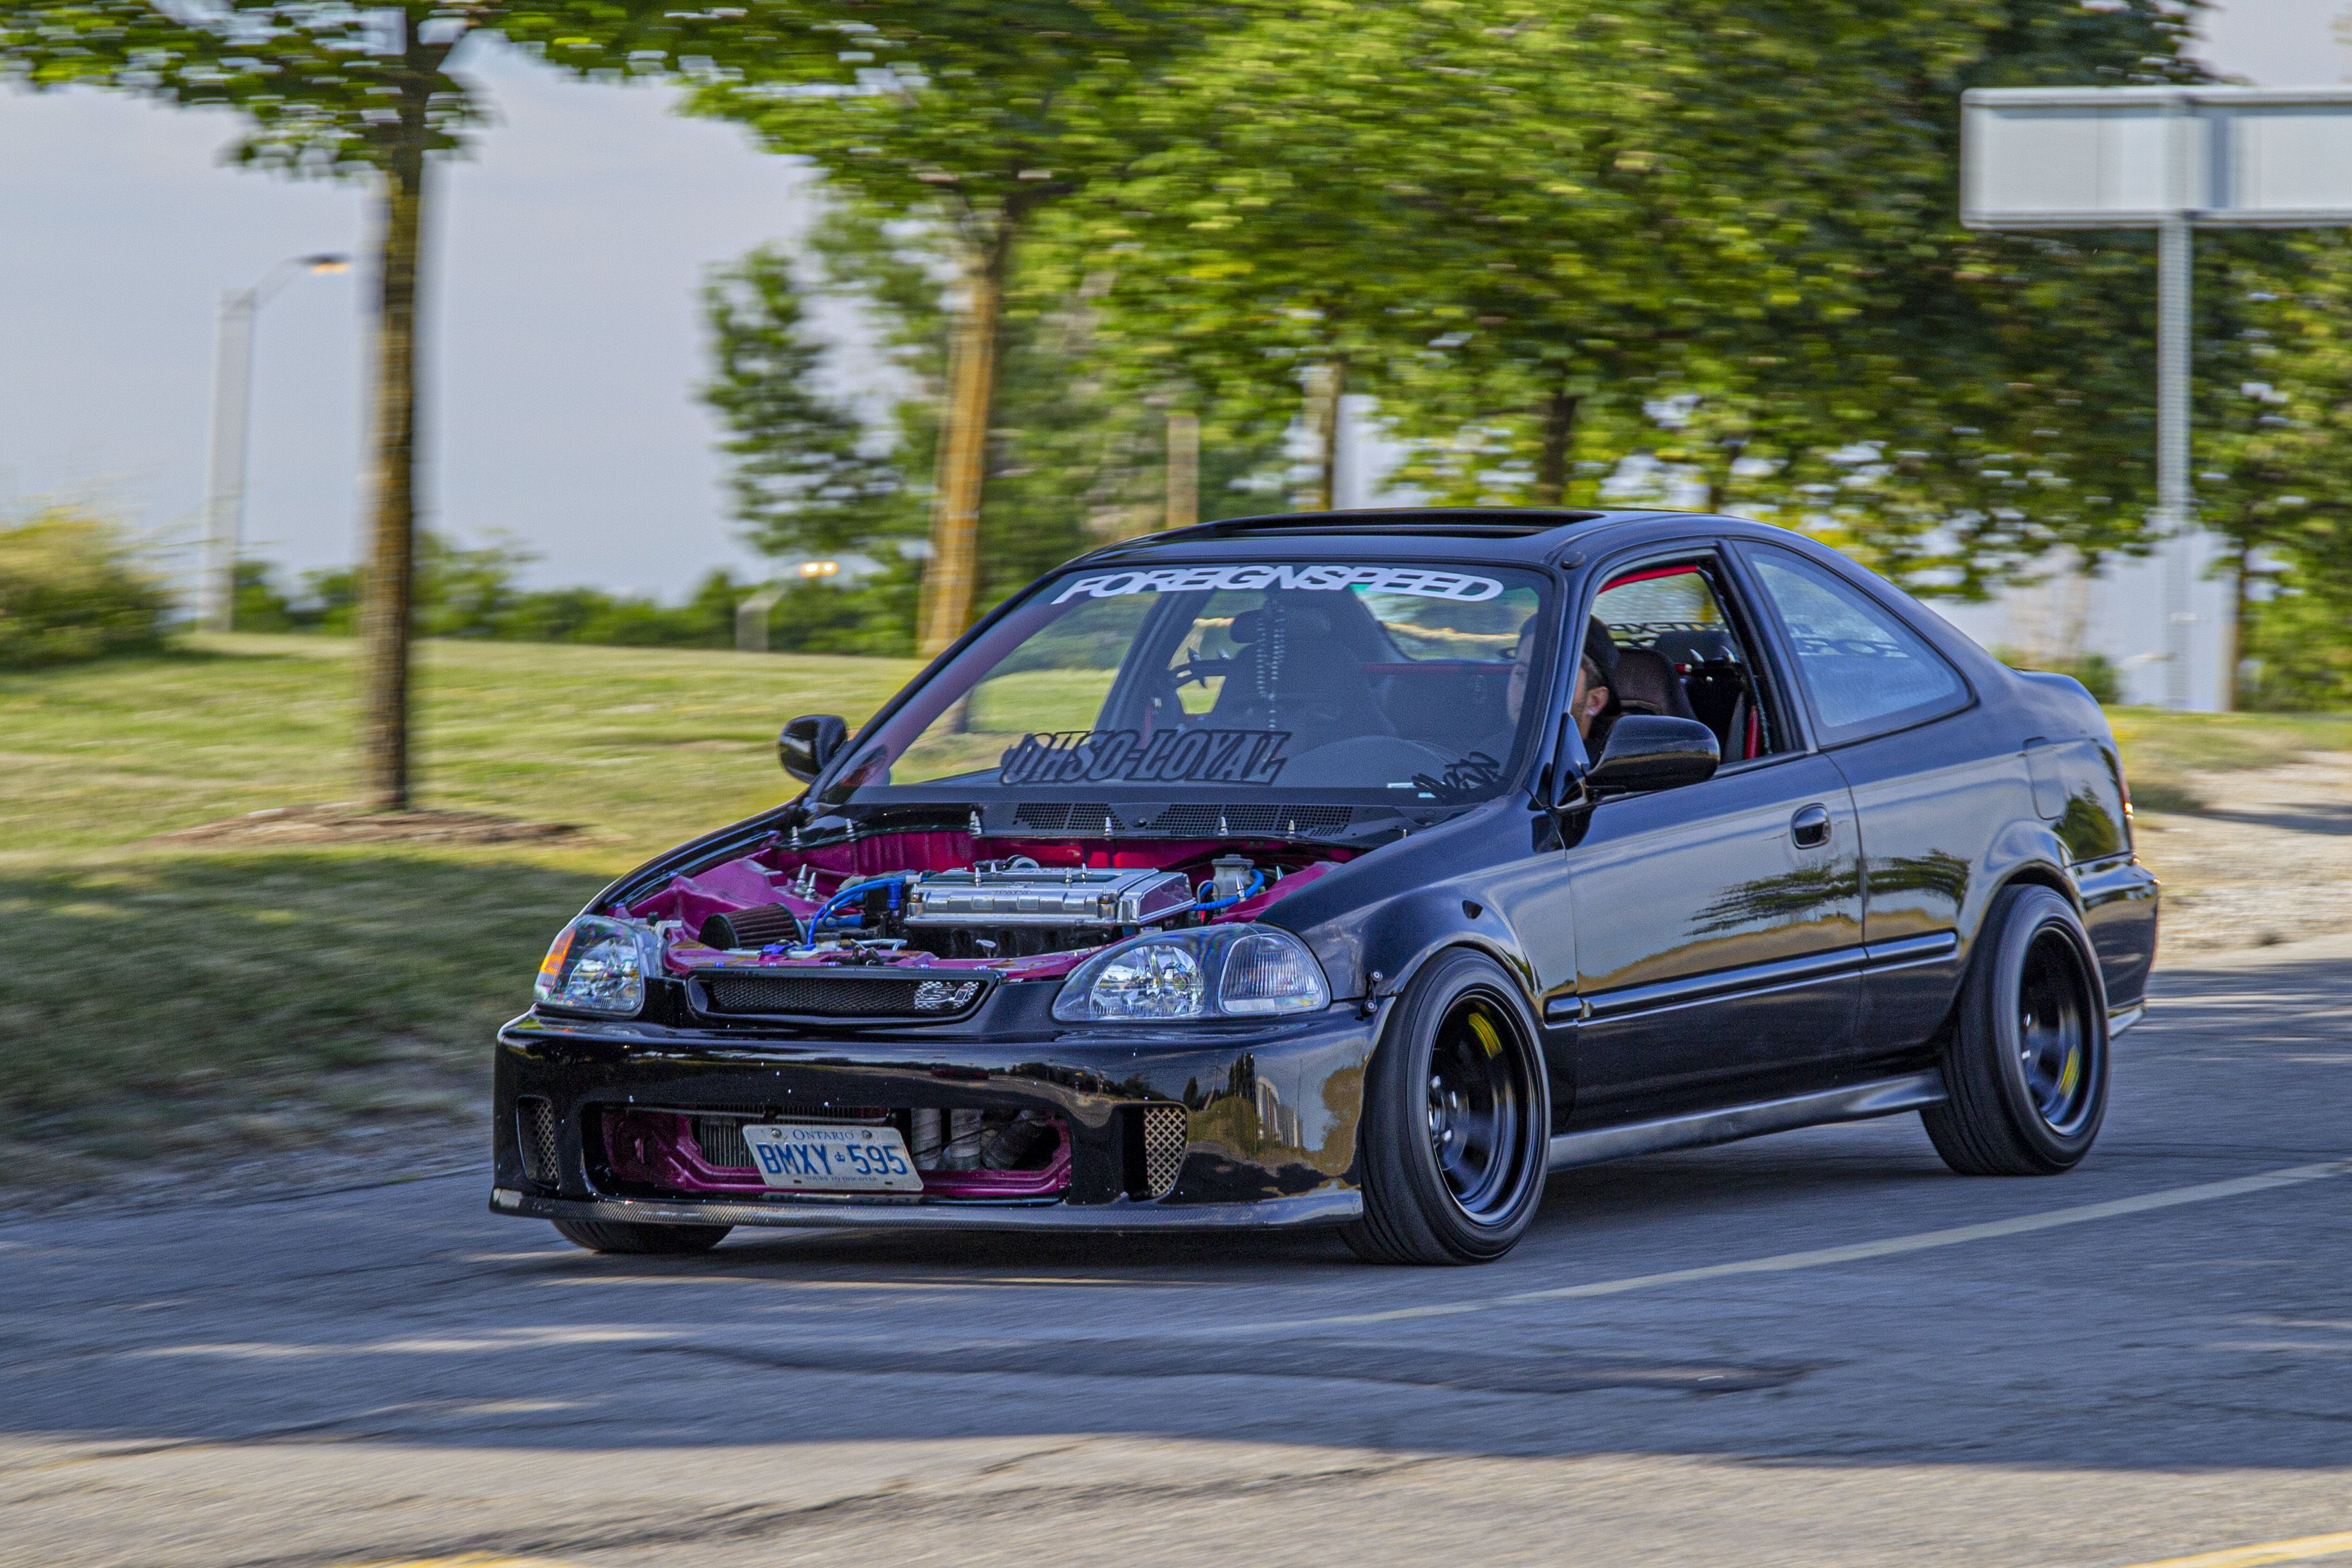 Honda civic no hood because clean engine bay